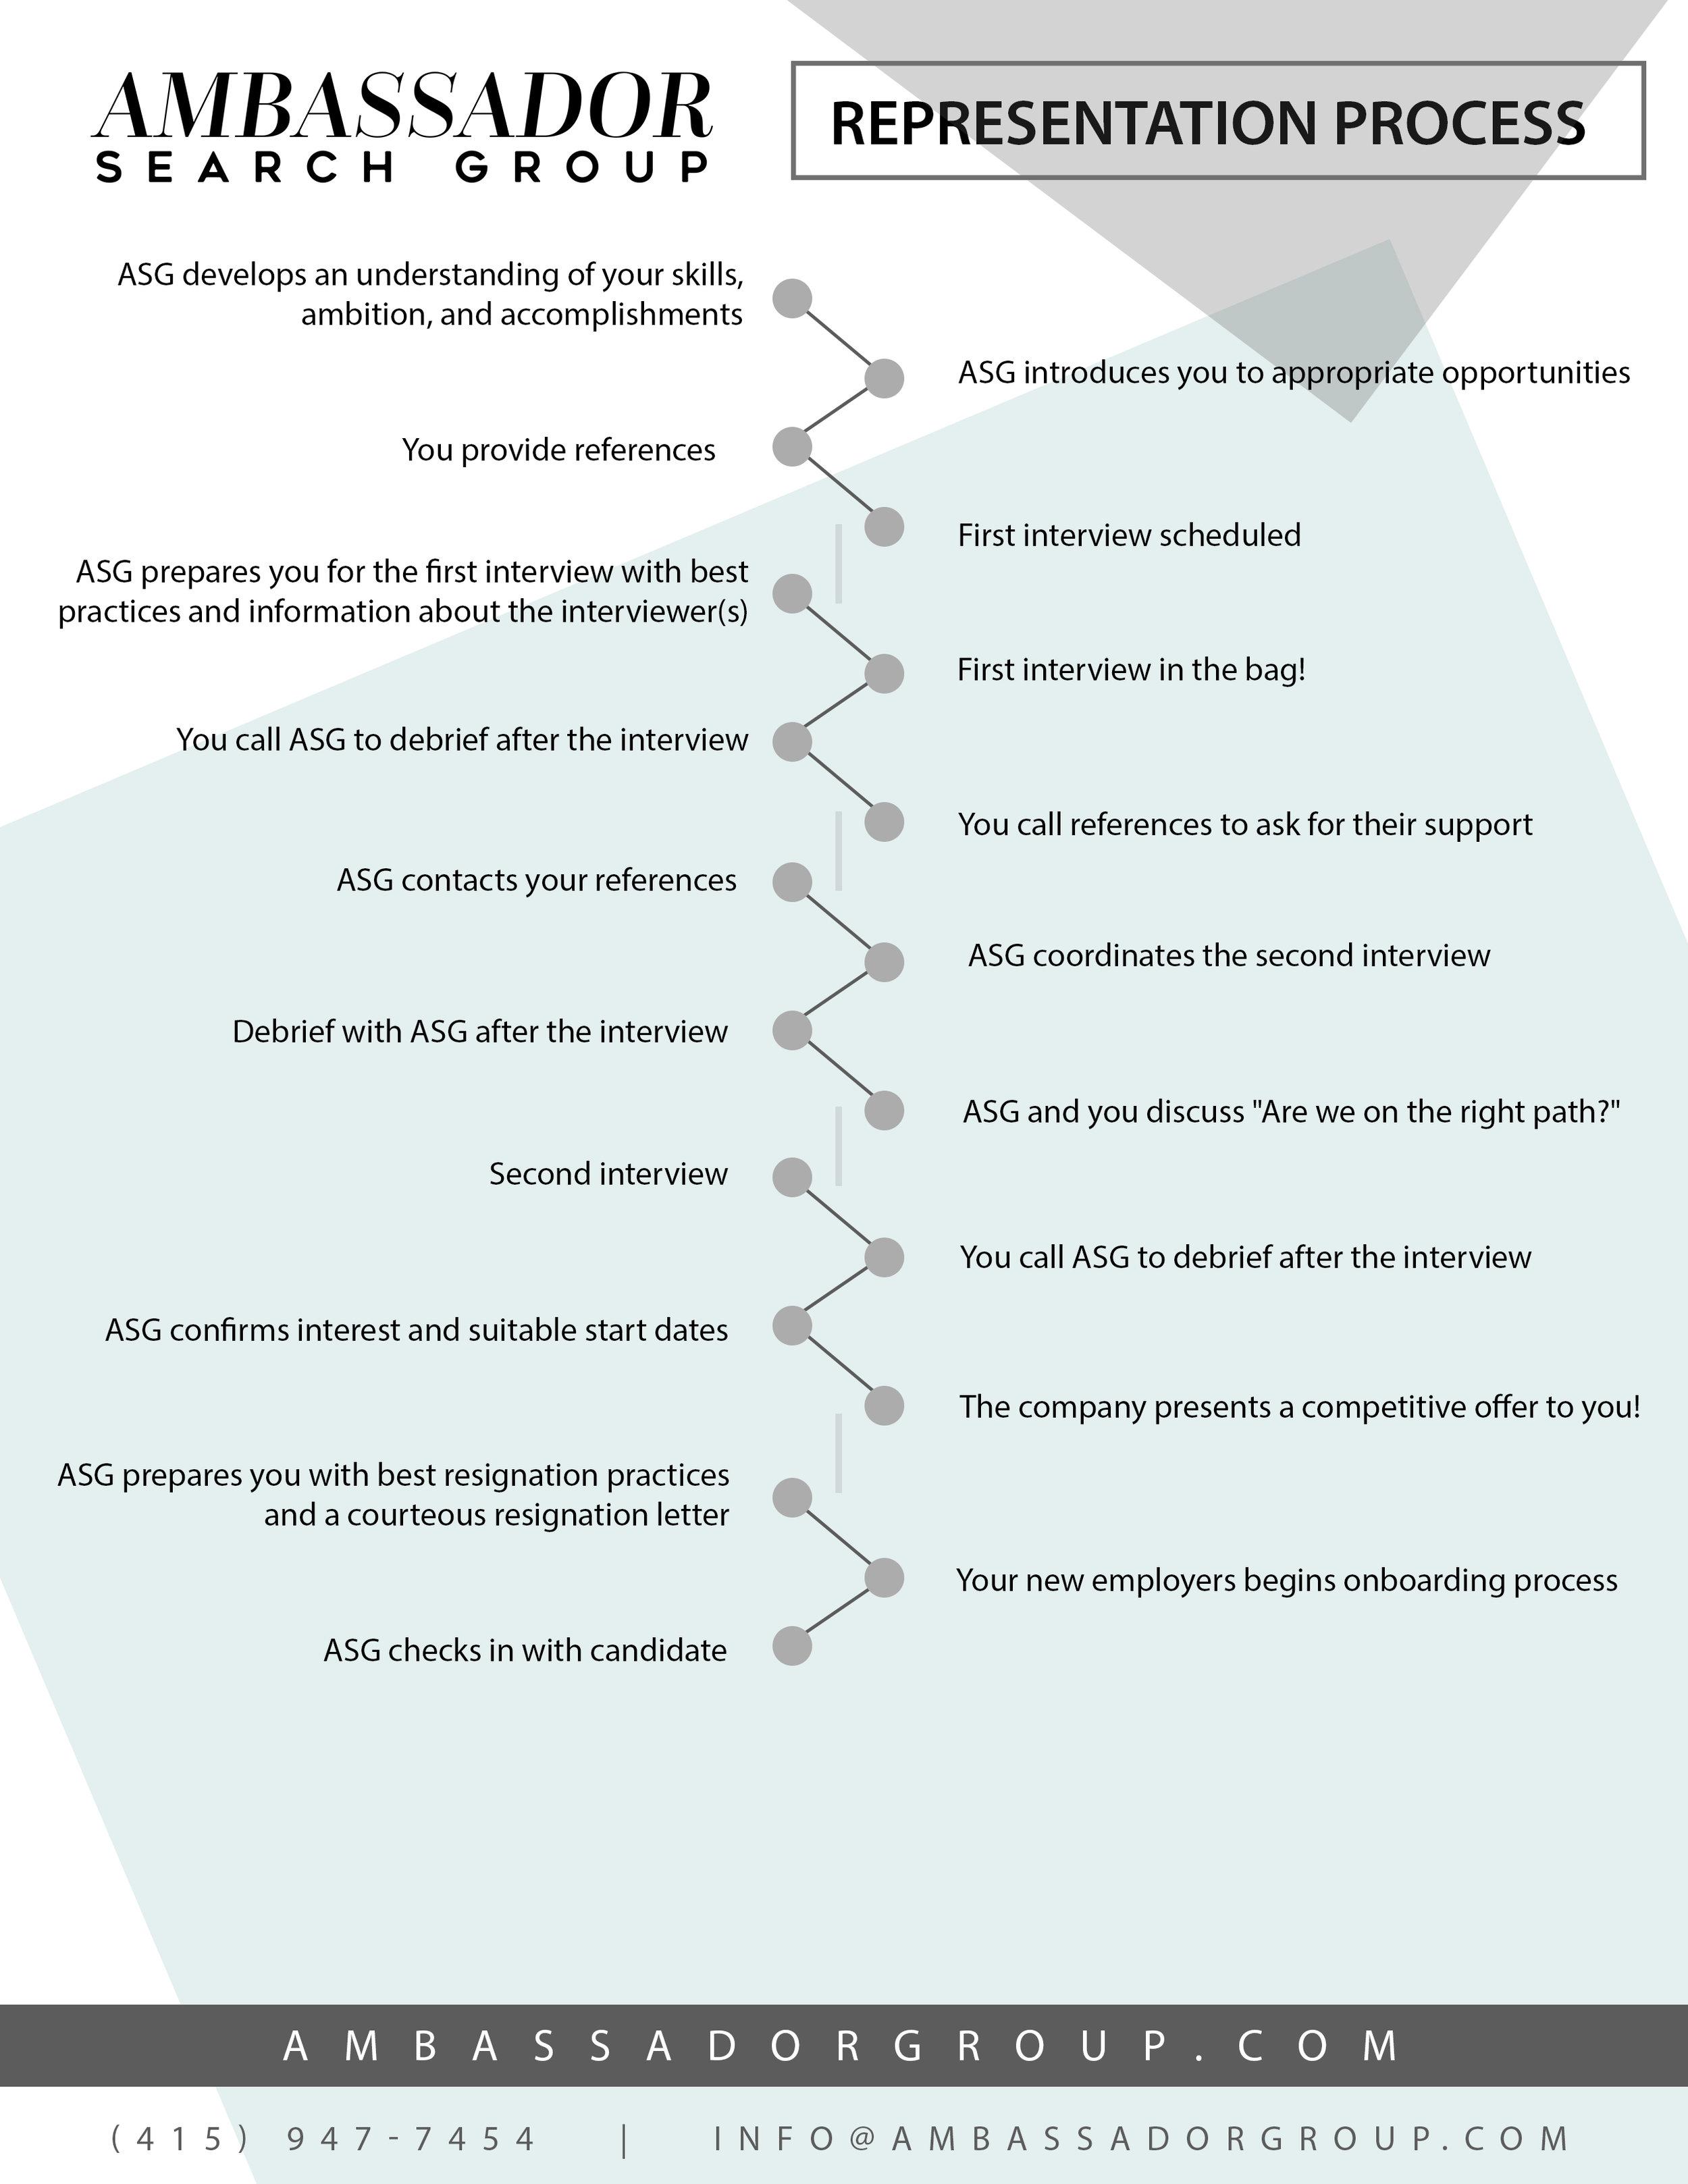 Representation Process.jpg